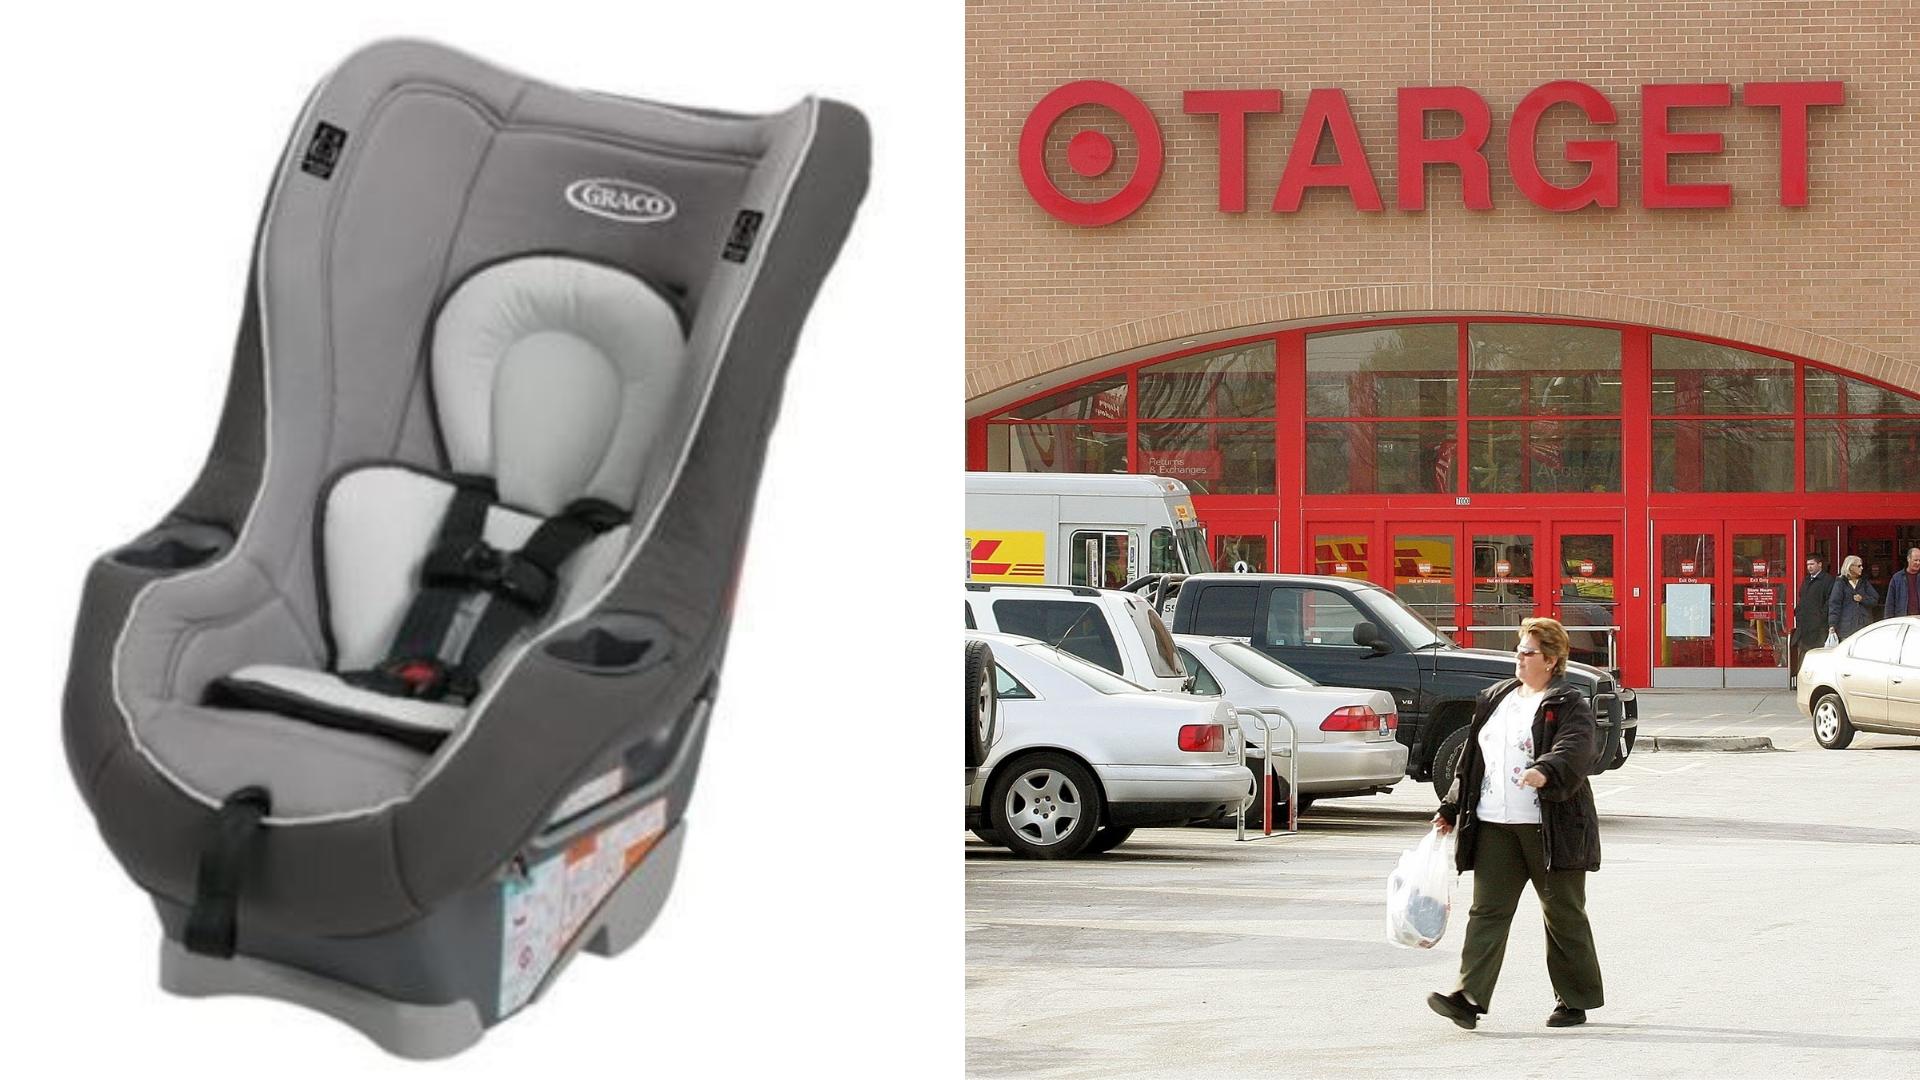 Trade, Don't Toss: Target hosting car seat trade-in program, offeringdiscounts